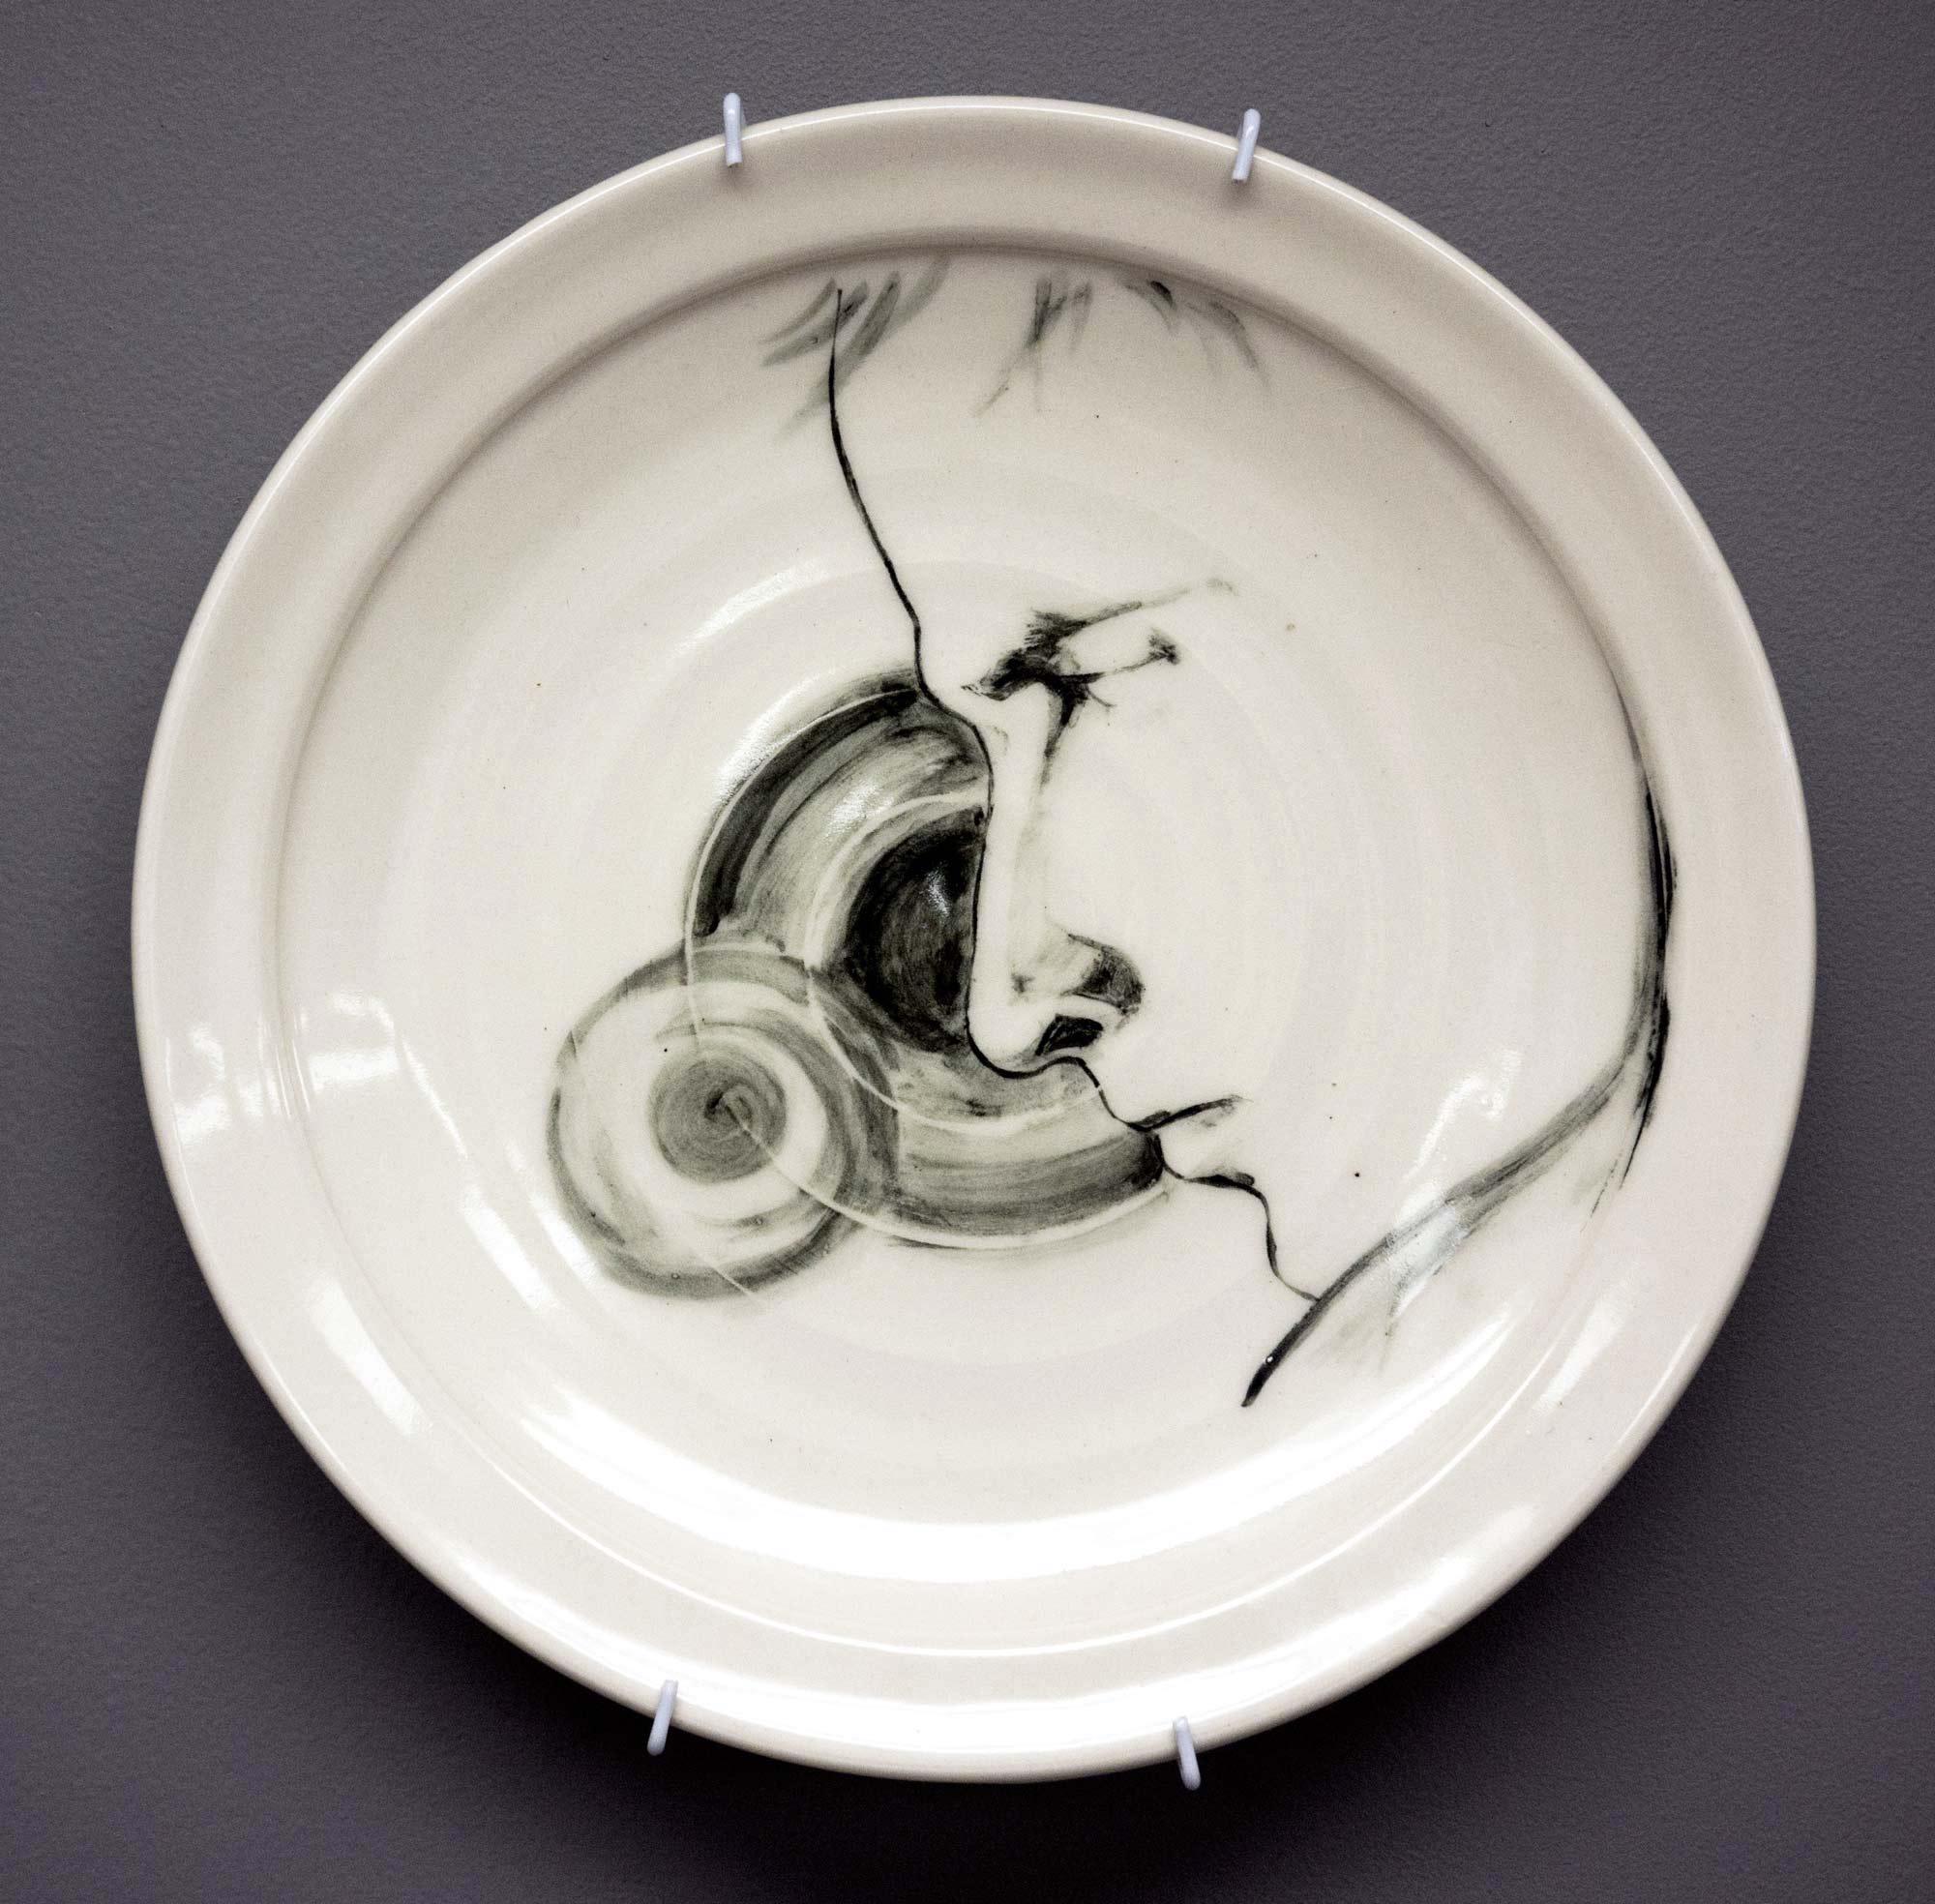 Collaborative Plate: Josh Skenes-Saison